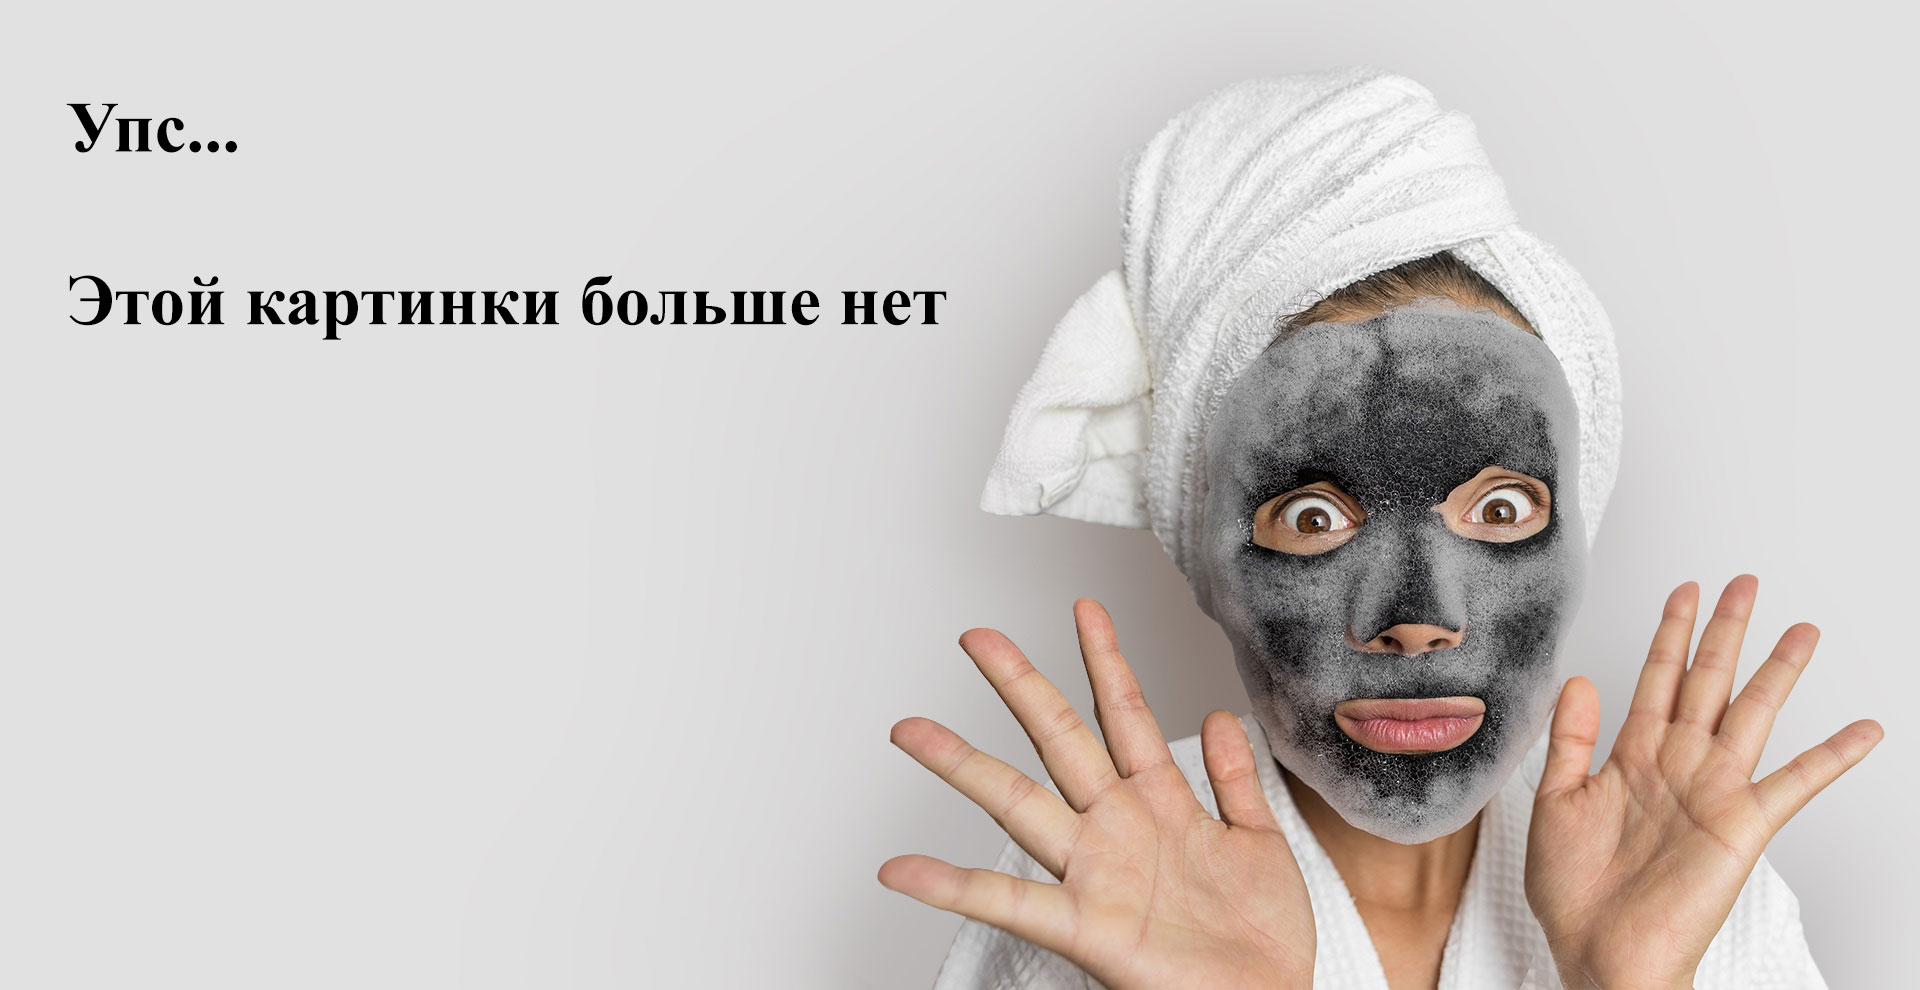 Patrisa Nail, Дисплей веерный на кольце, белый, 50 шт.